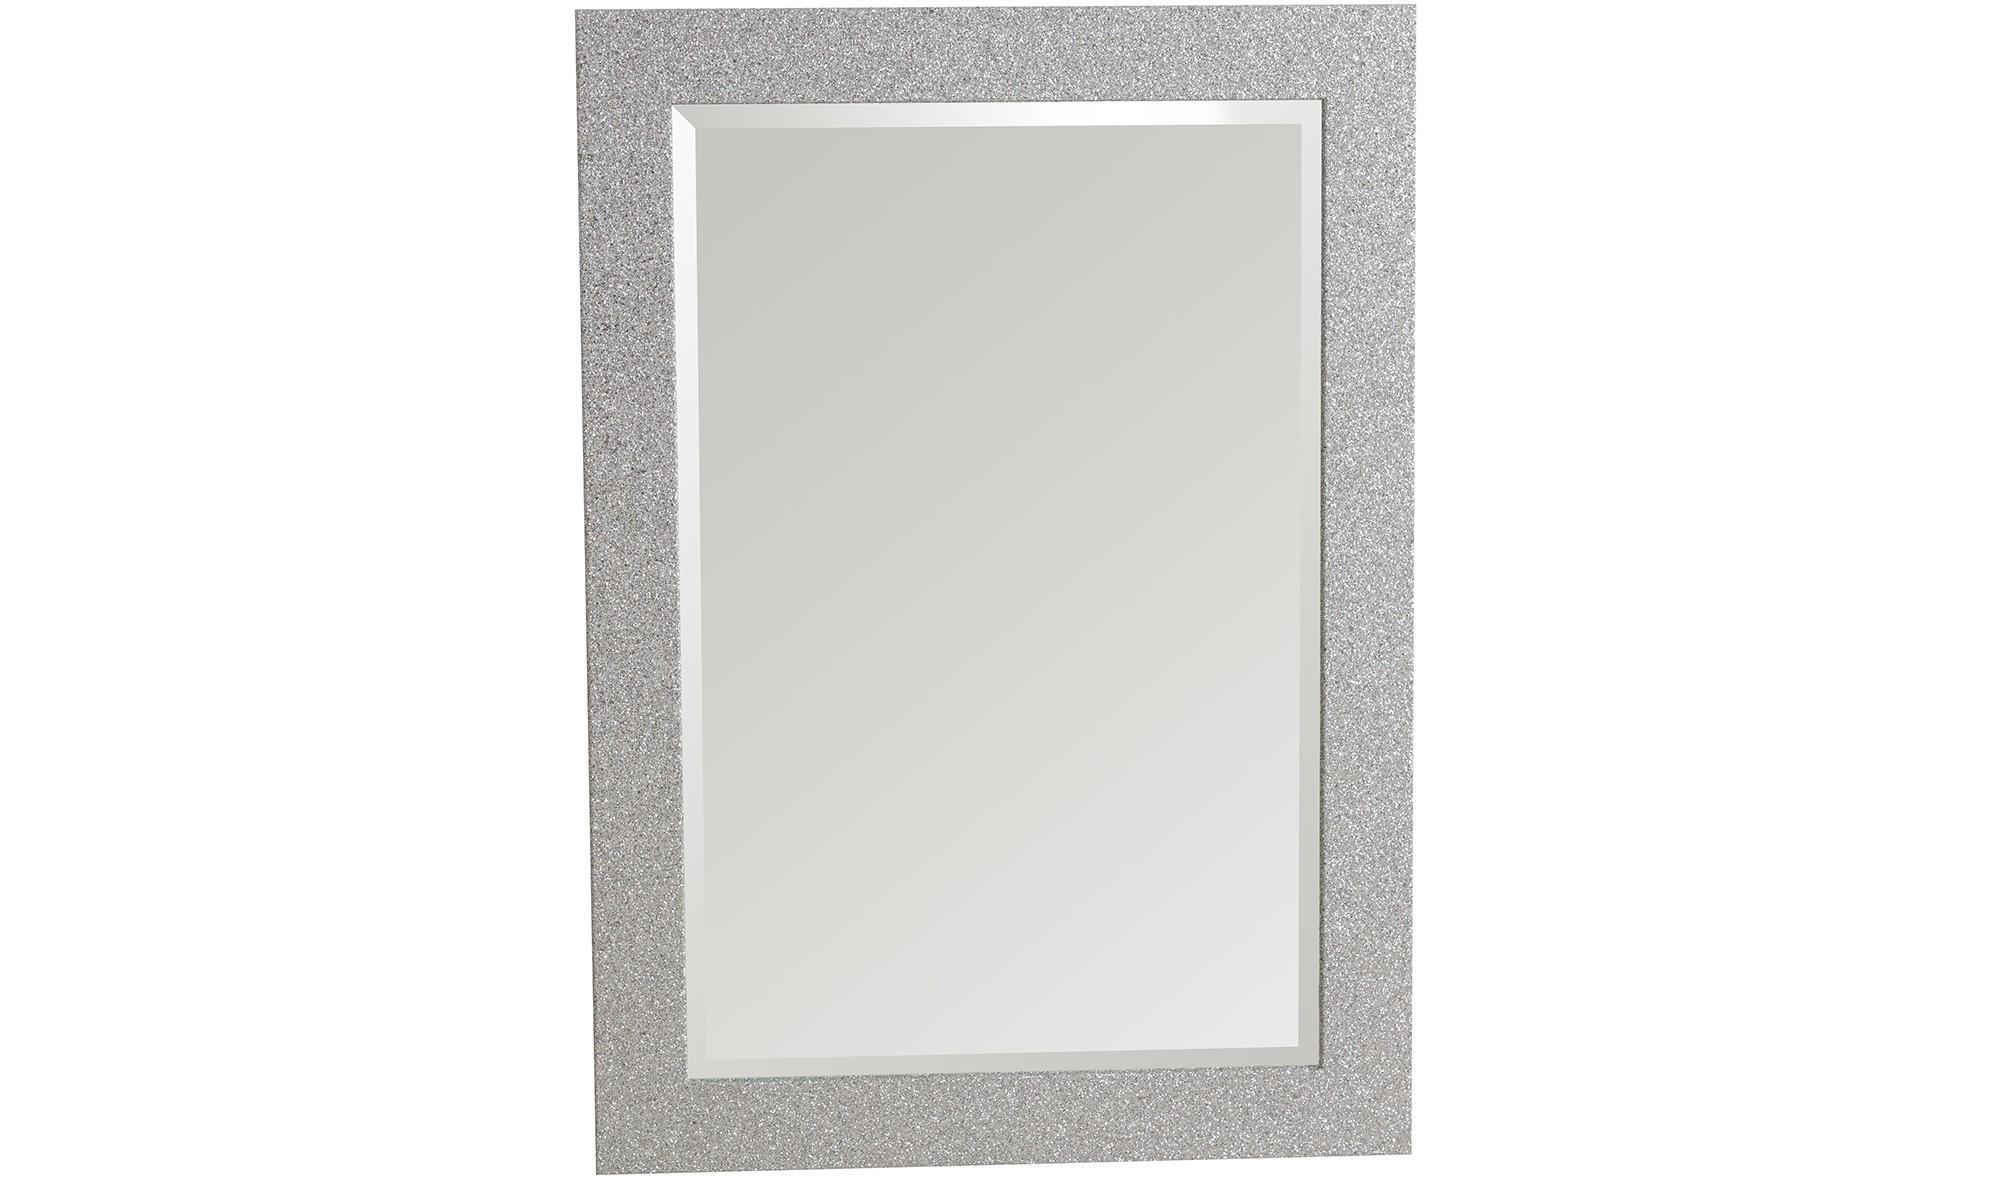 Glitter Mirror | Inovodecor Throughout Glitter Frame Mirror (Image 9 of 20)